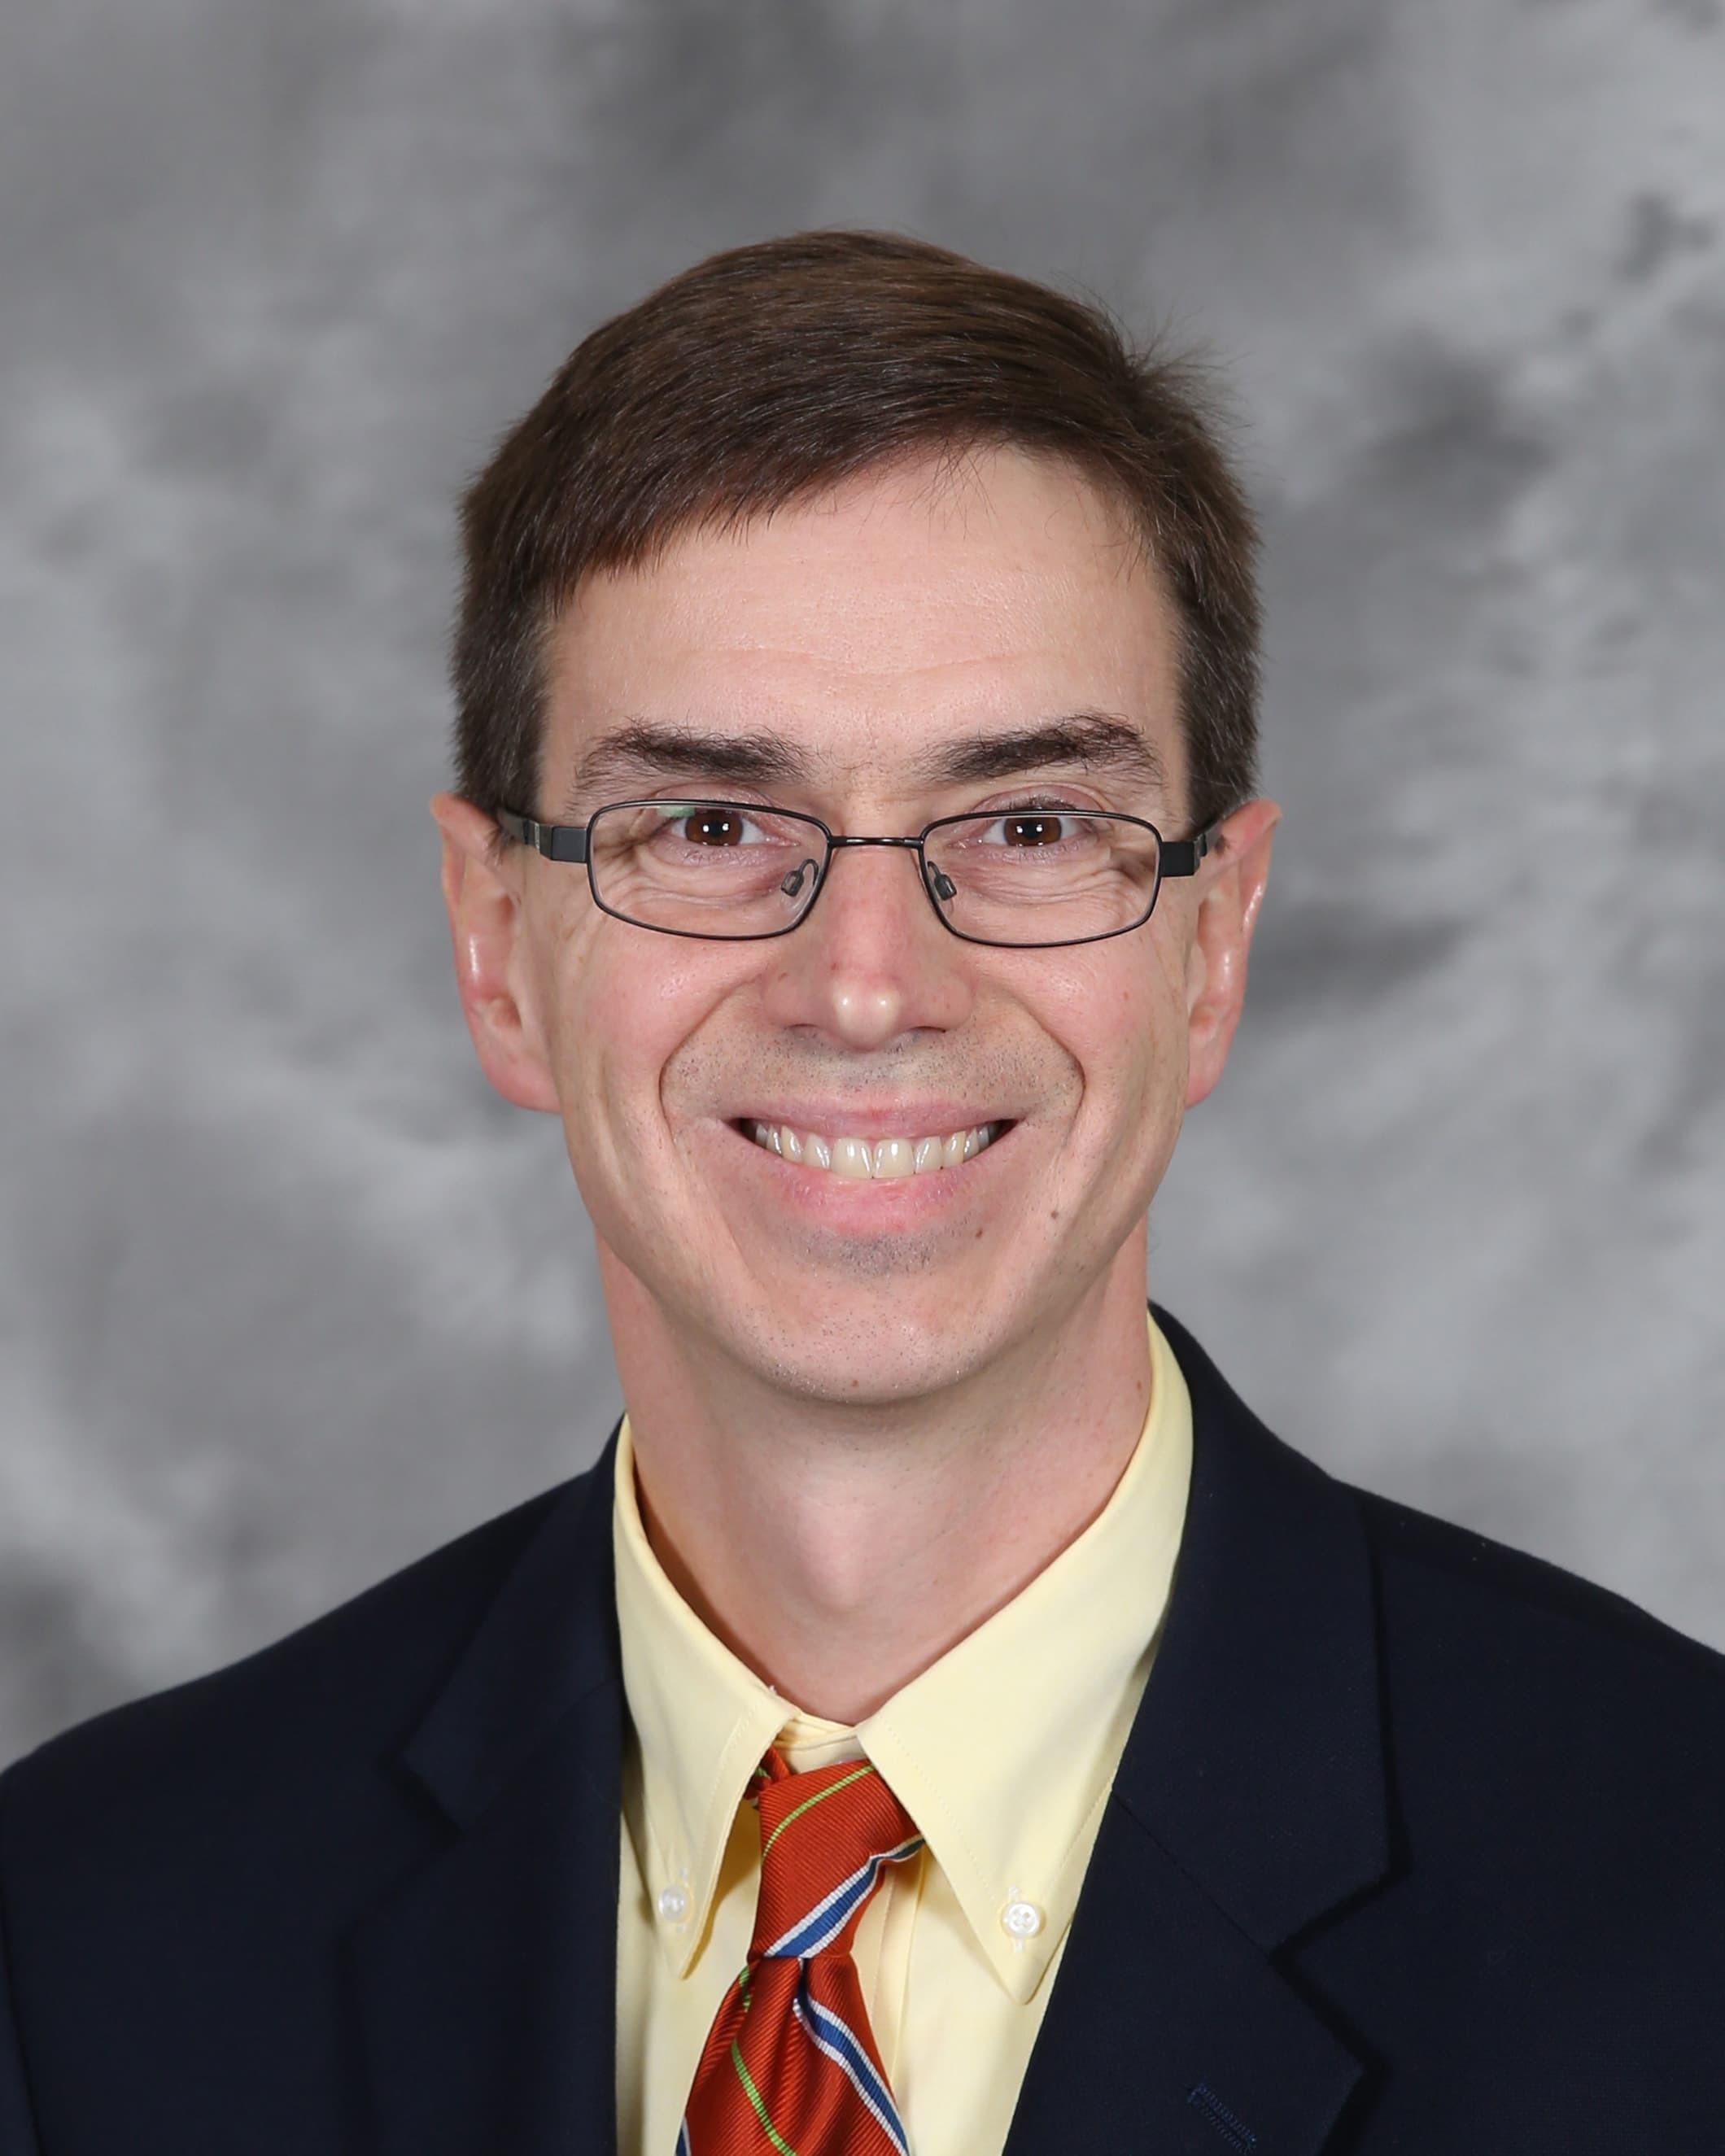 Gerald D Mick, MD